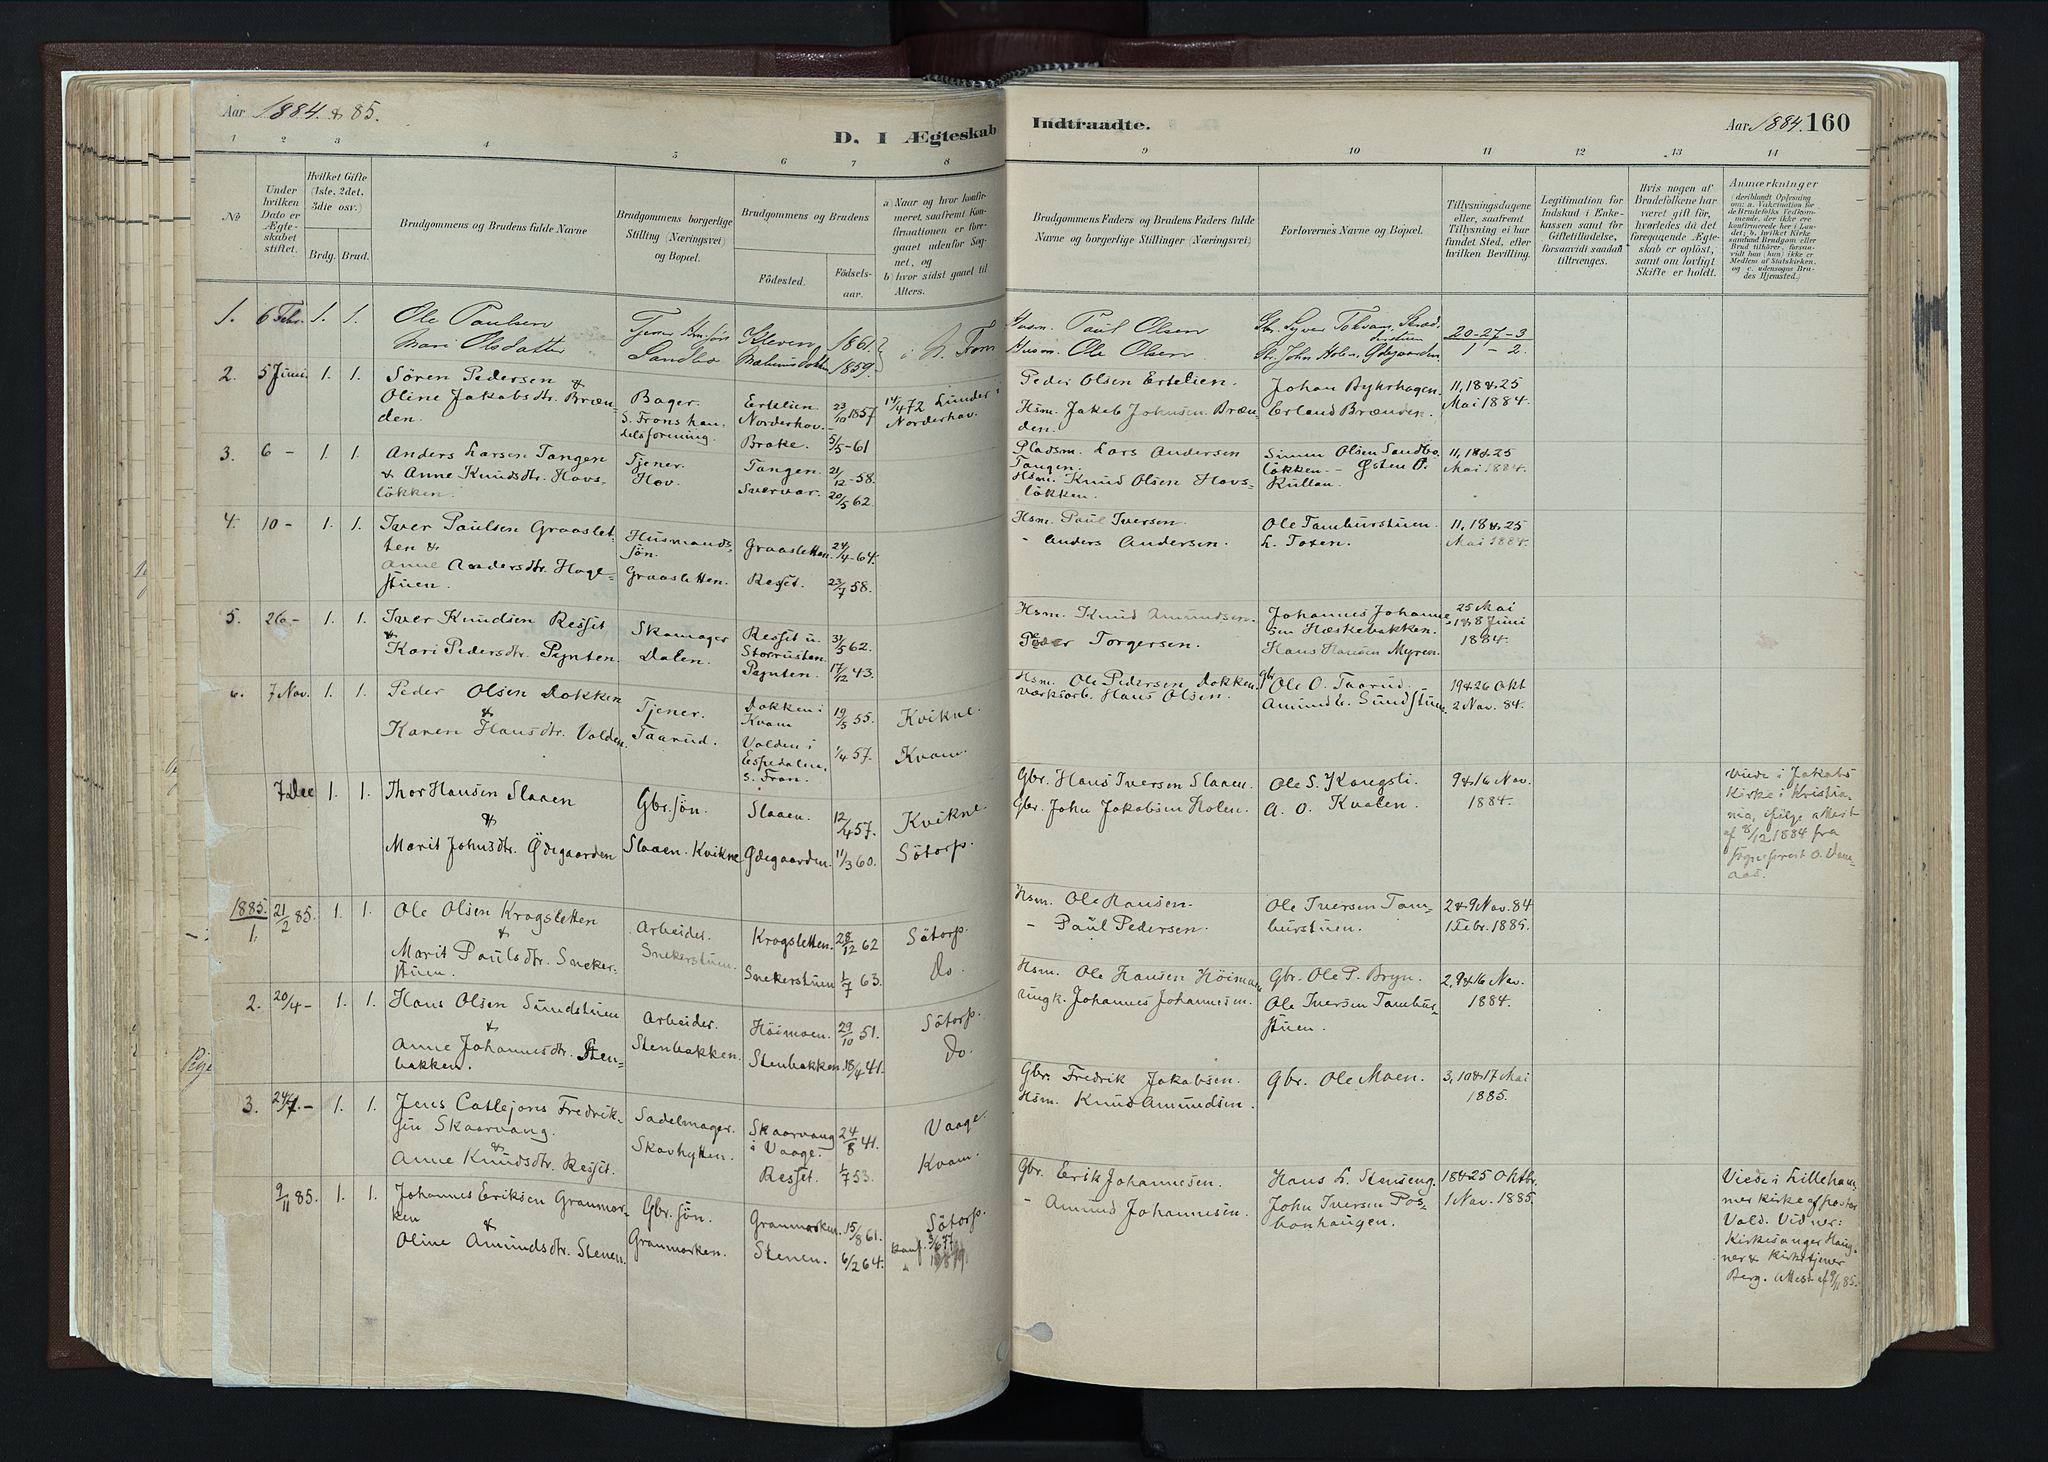 SAH, Nord-Fron prestekontor, Ministerialbok nr. 4, 1884-1914, s. 160